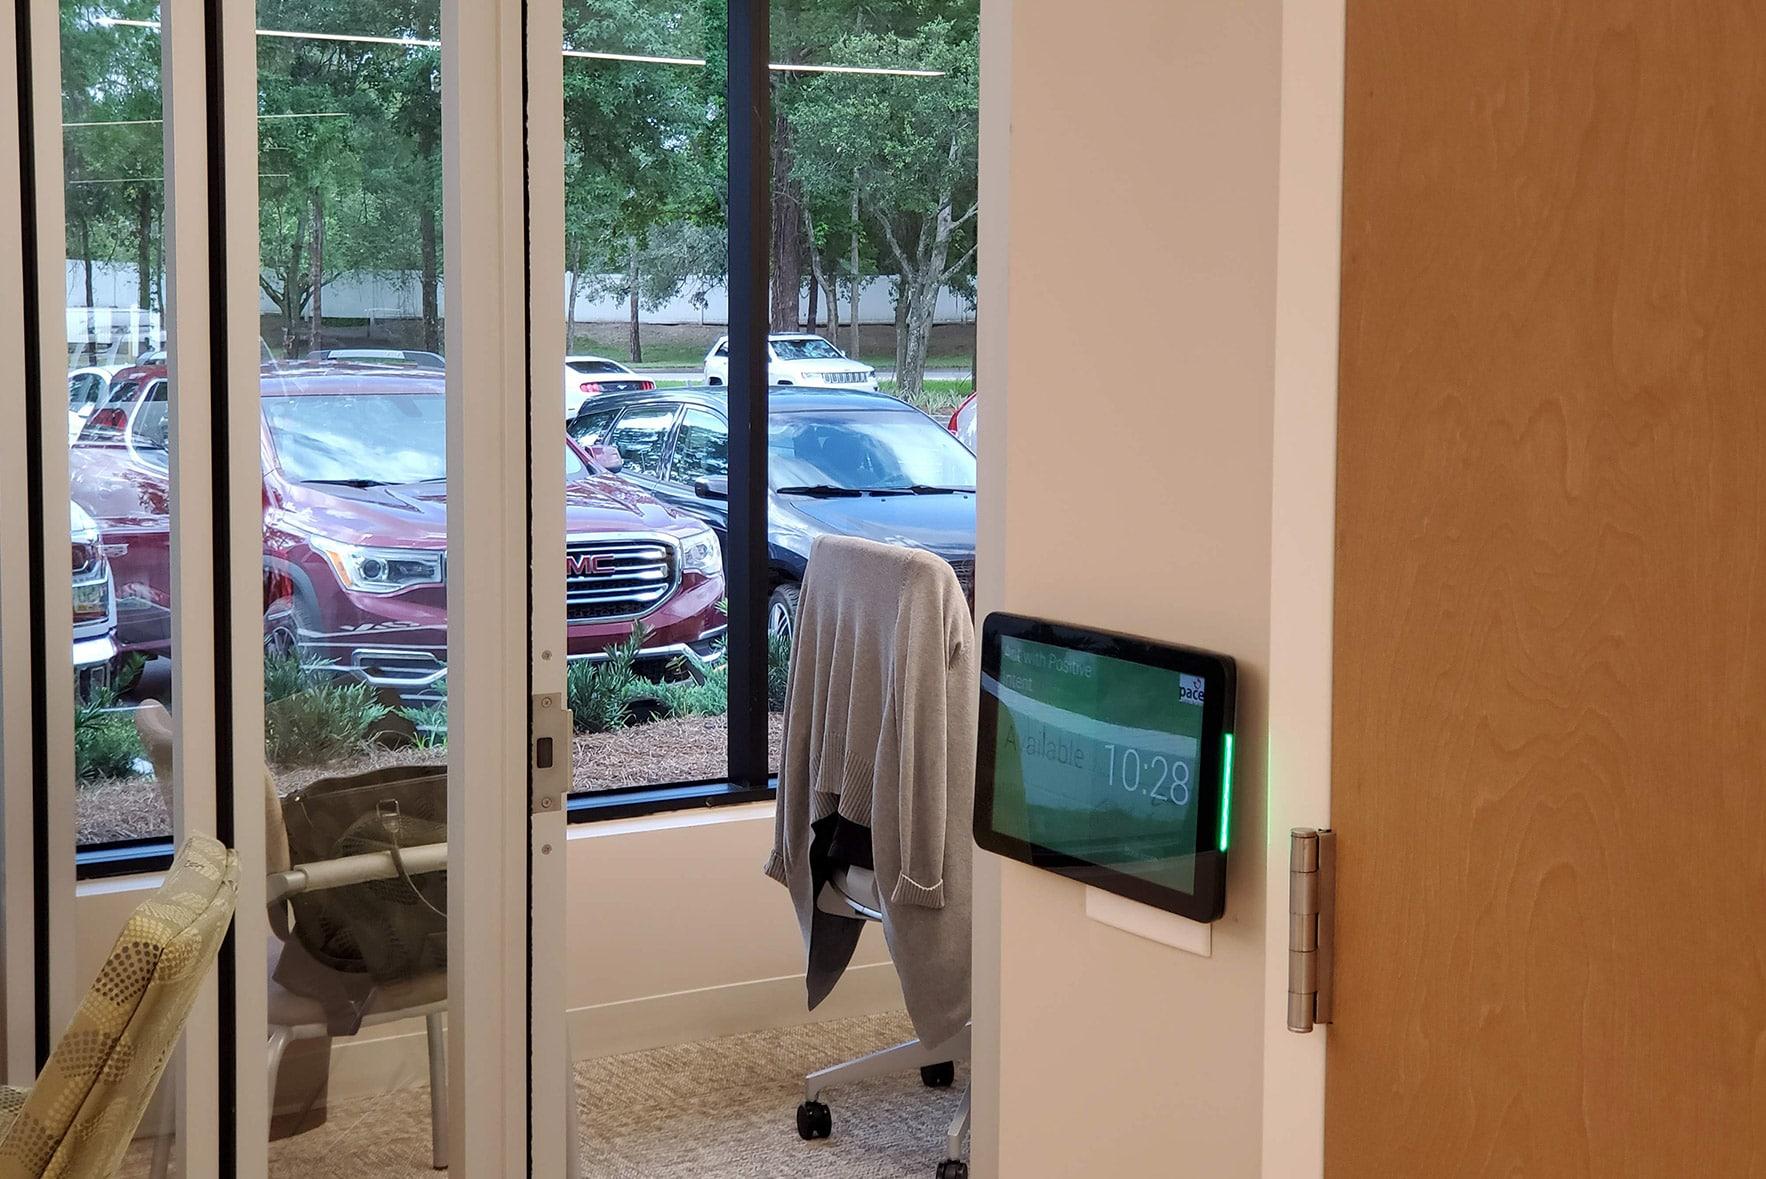 Meetio Room display outside a meeting room